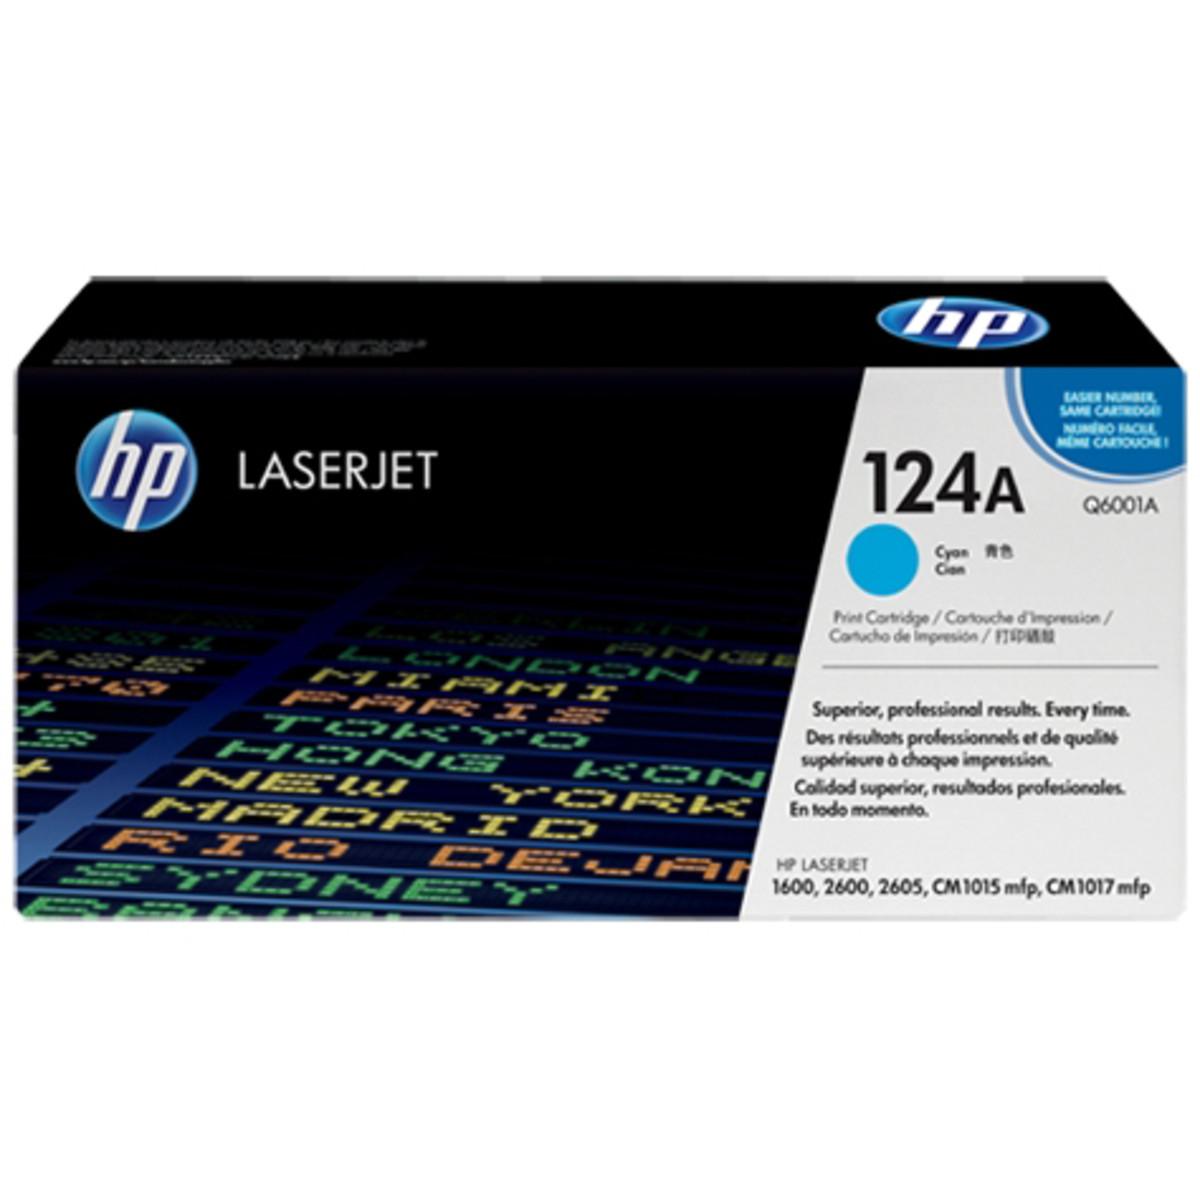 HP 124A (Q6001A) Cyan Toner Cartridge